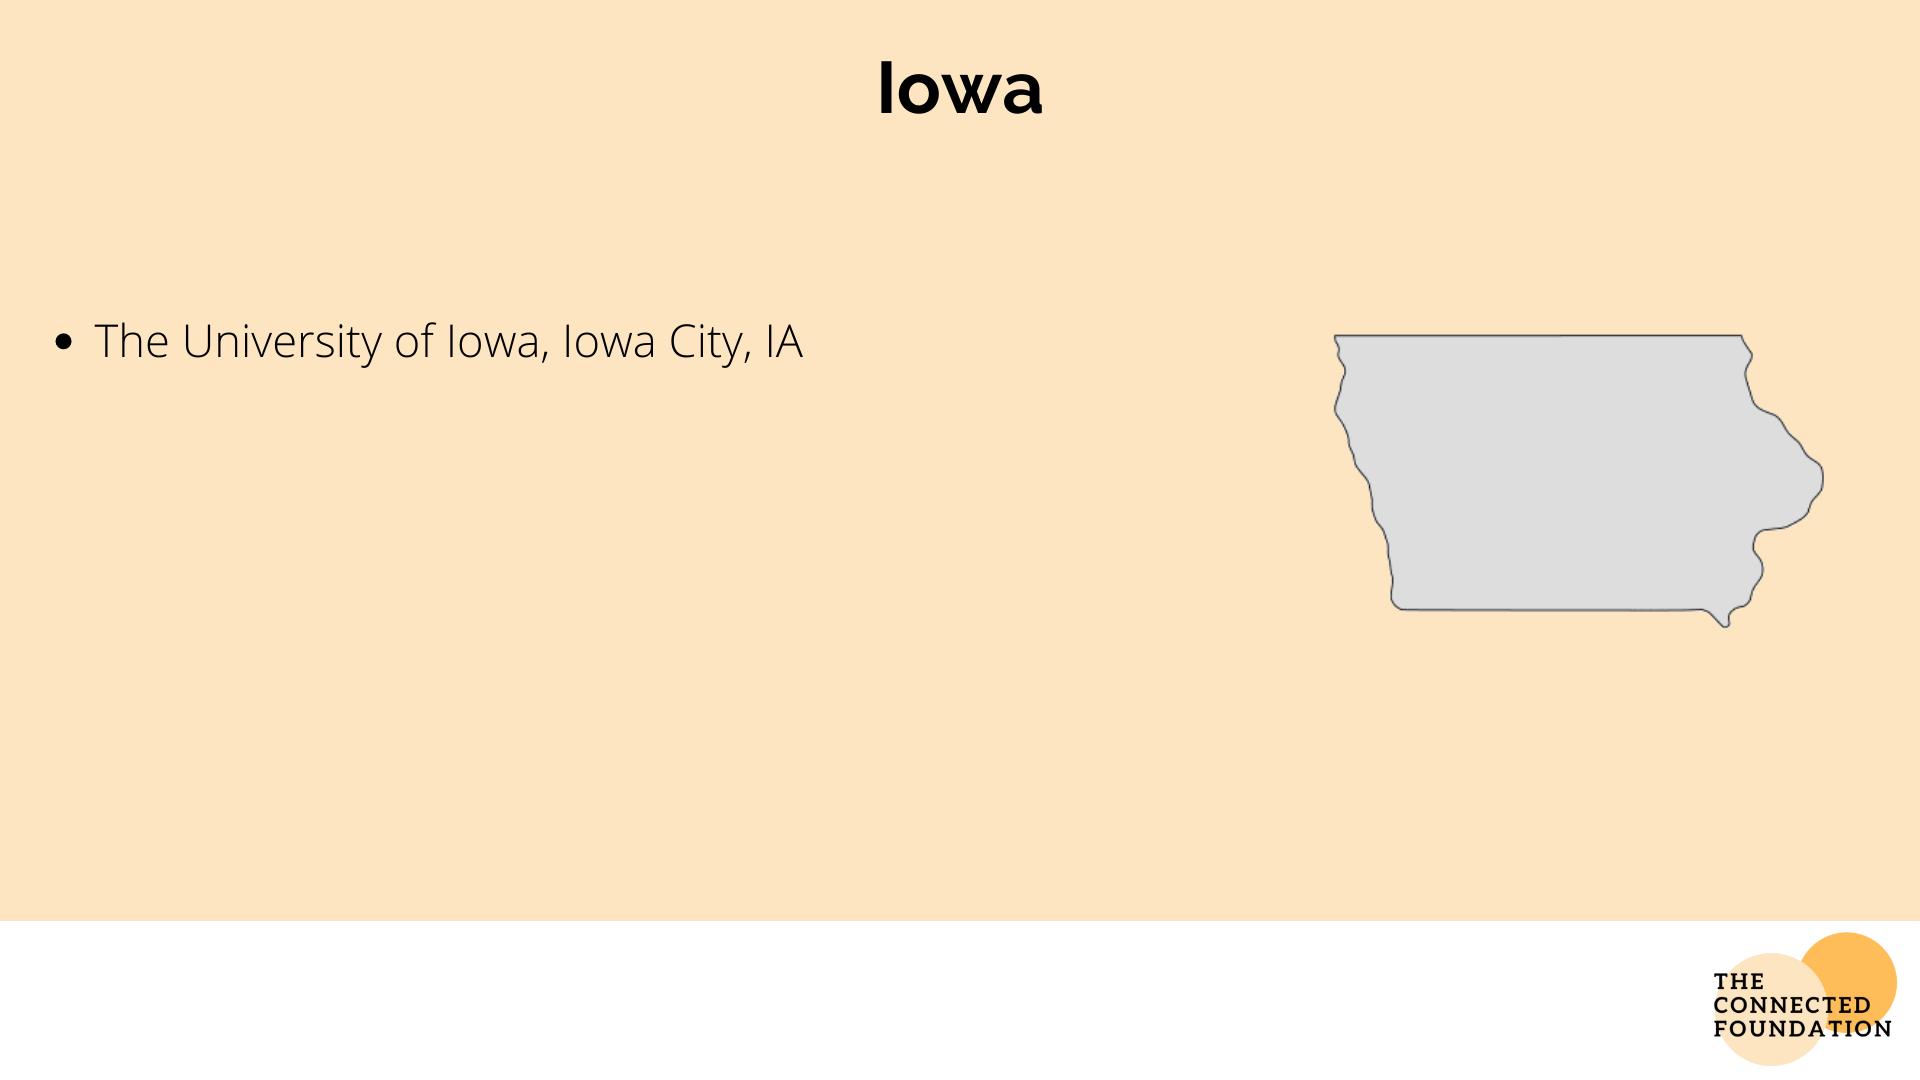 University of Iowa in Iowa